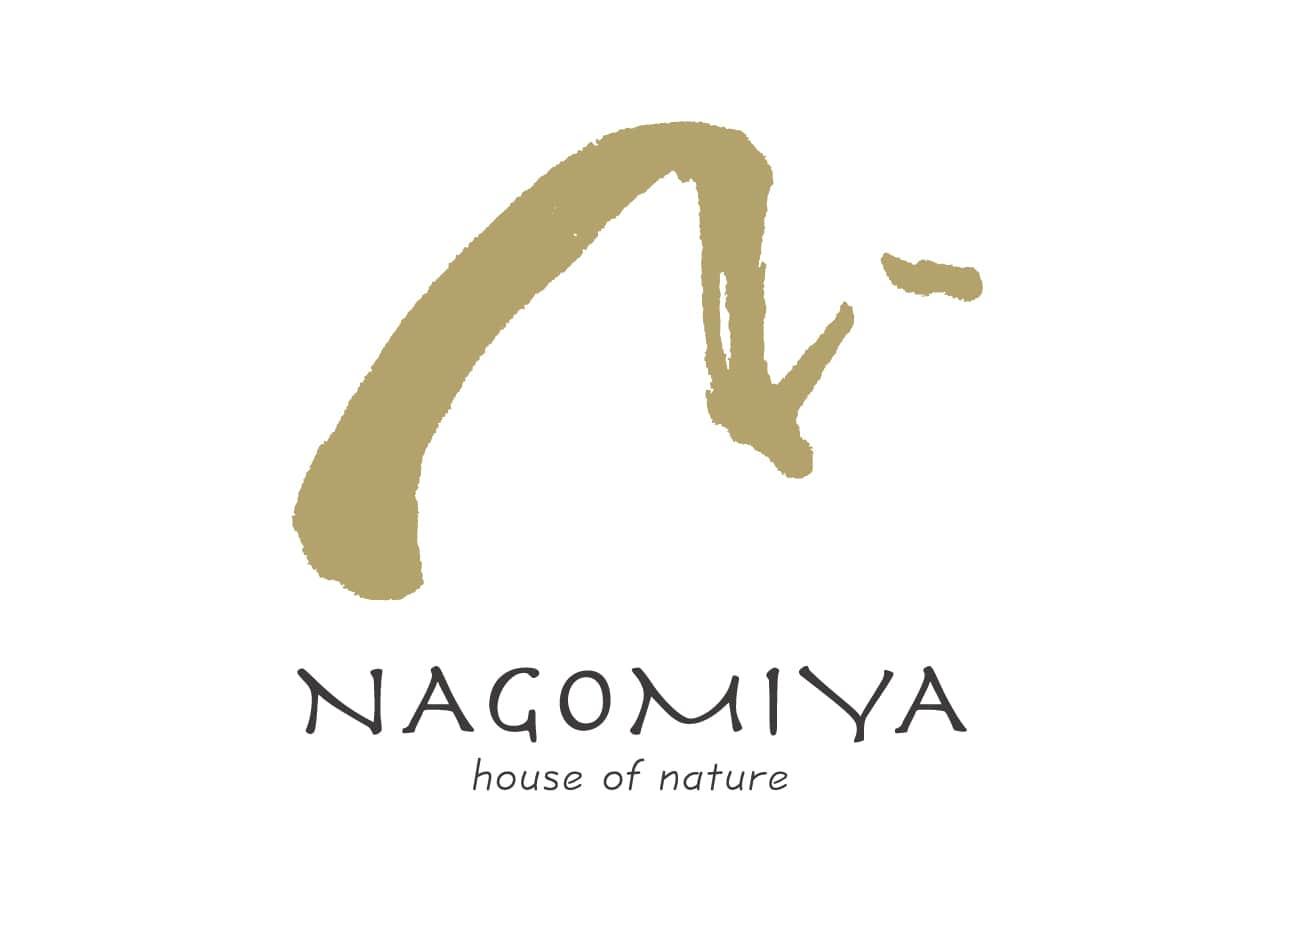 NAGOMIYAのロゴ